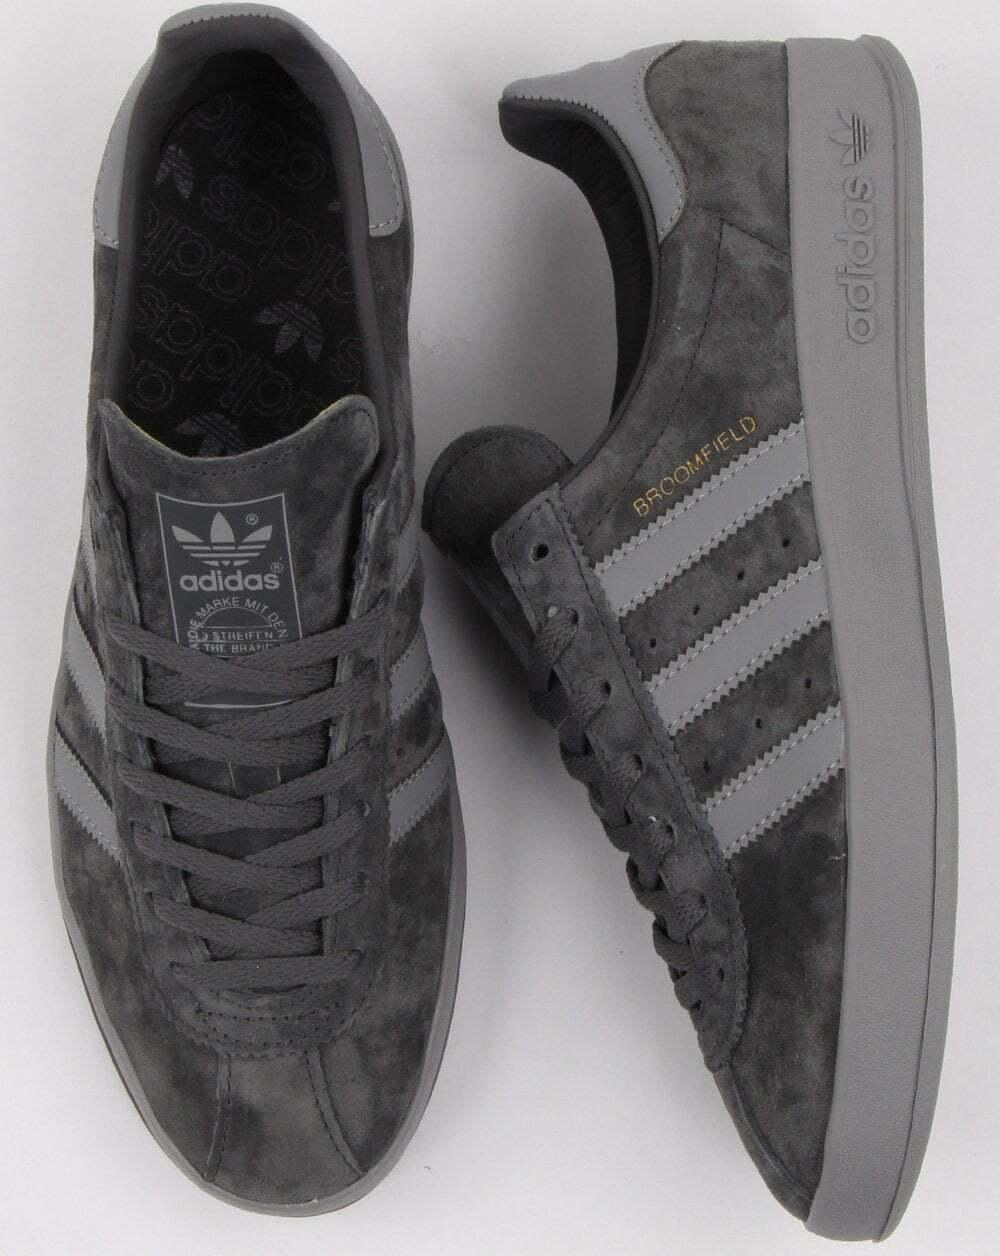 Adidas Originals Broomfield - Grey